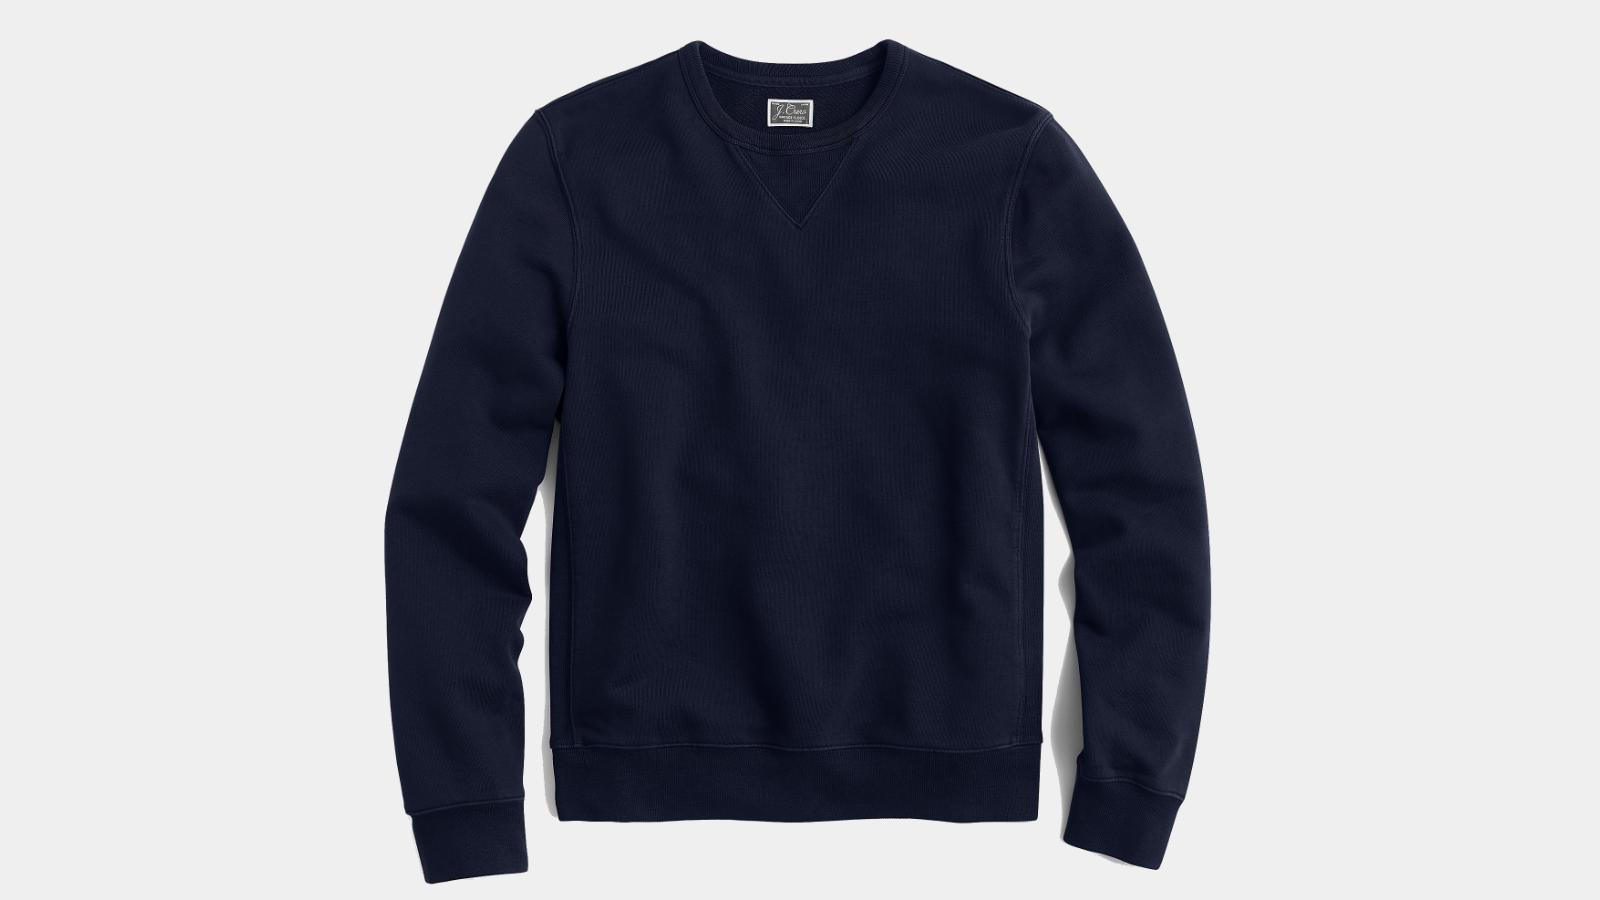 Mens Fashion-Fit Vintage Pilled Herrington Crew Neck Fleece Sweatshirt